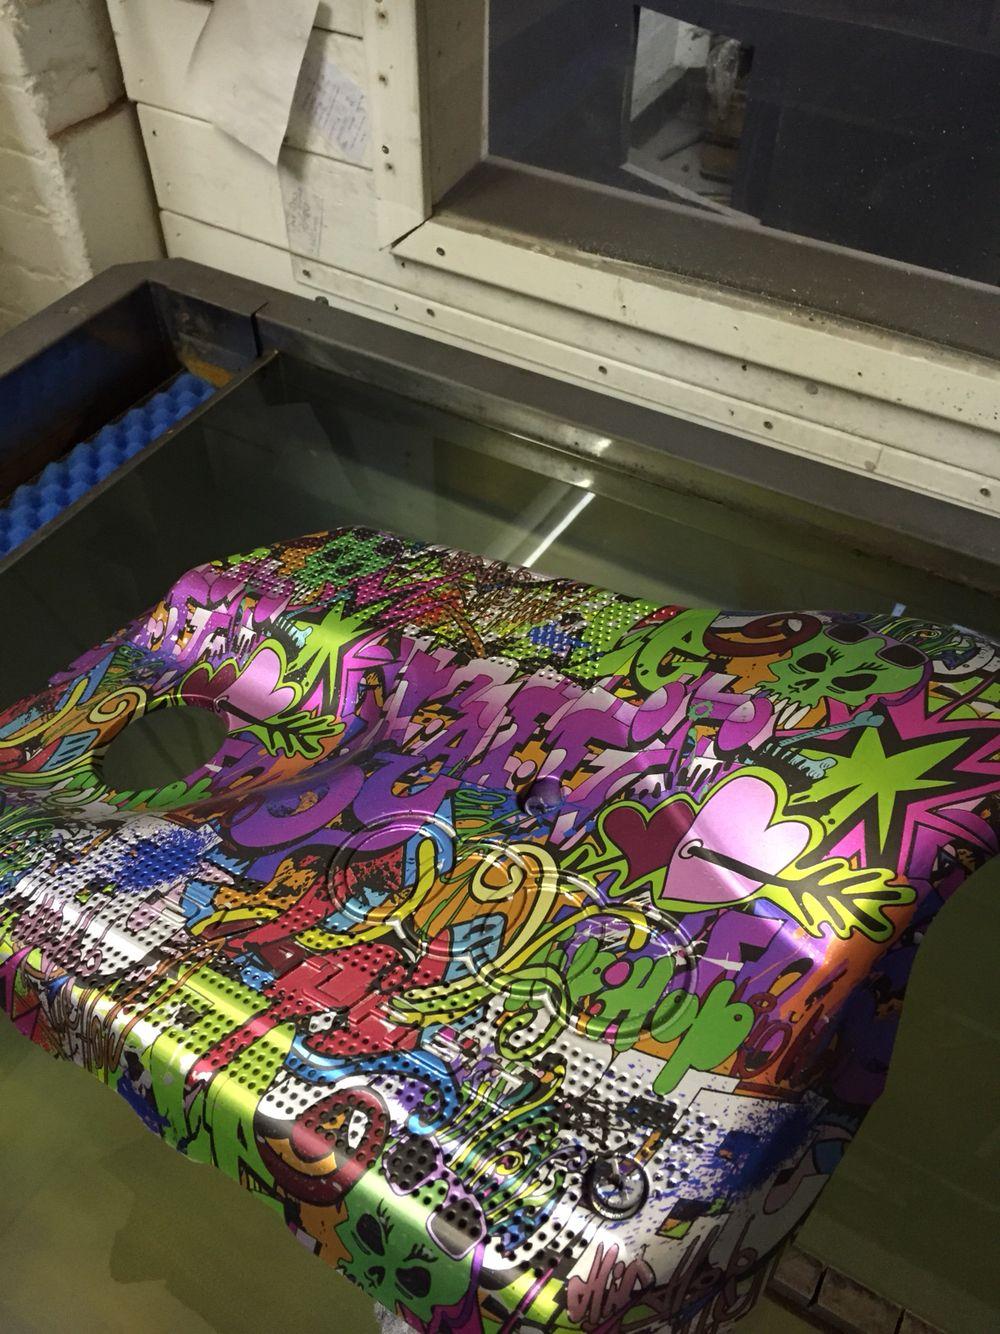 Audi Engine Cover Hydro Dipped in hip hop graffiti pattern